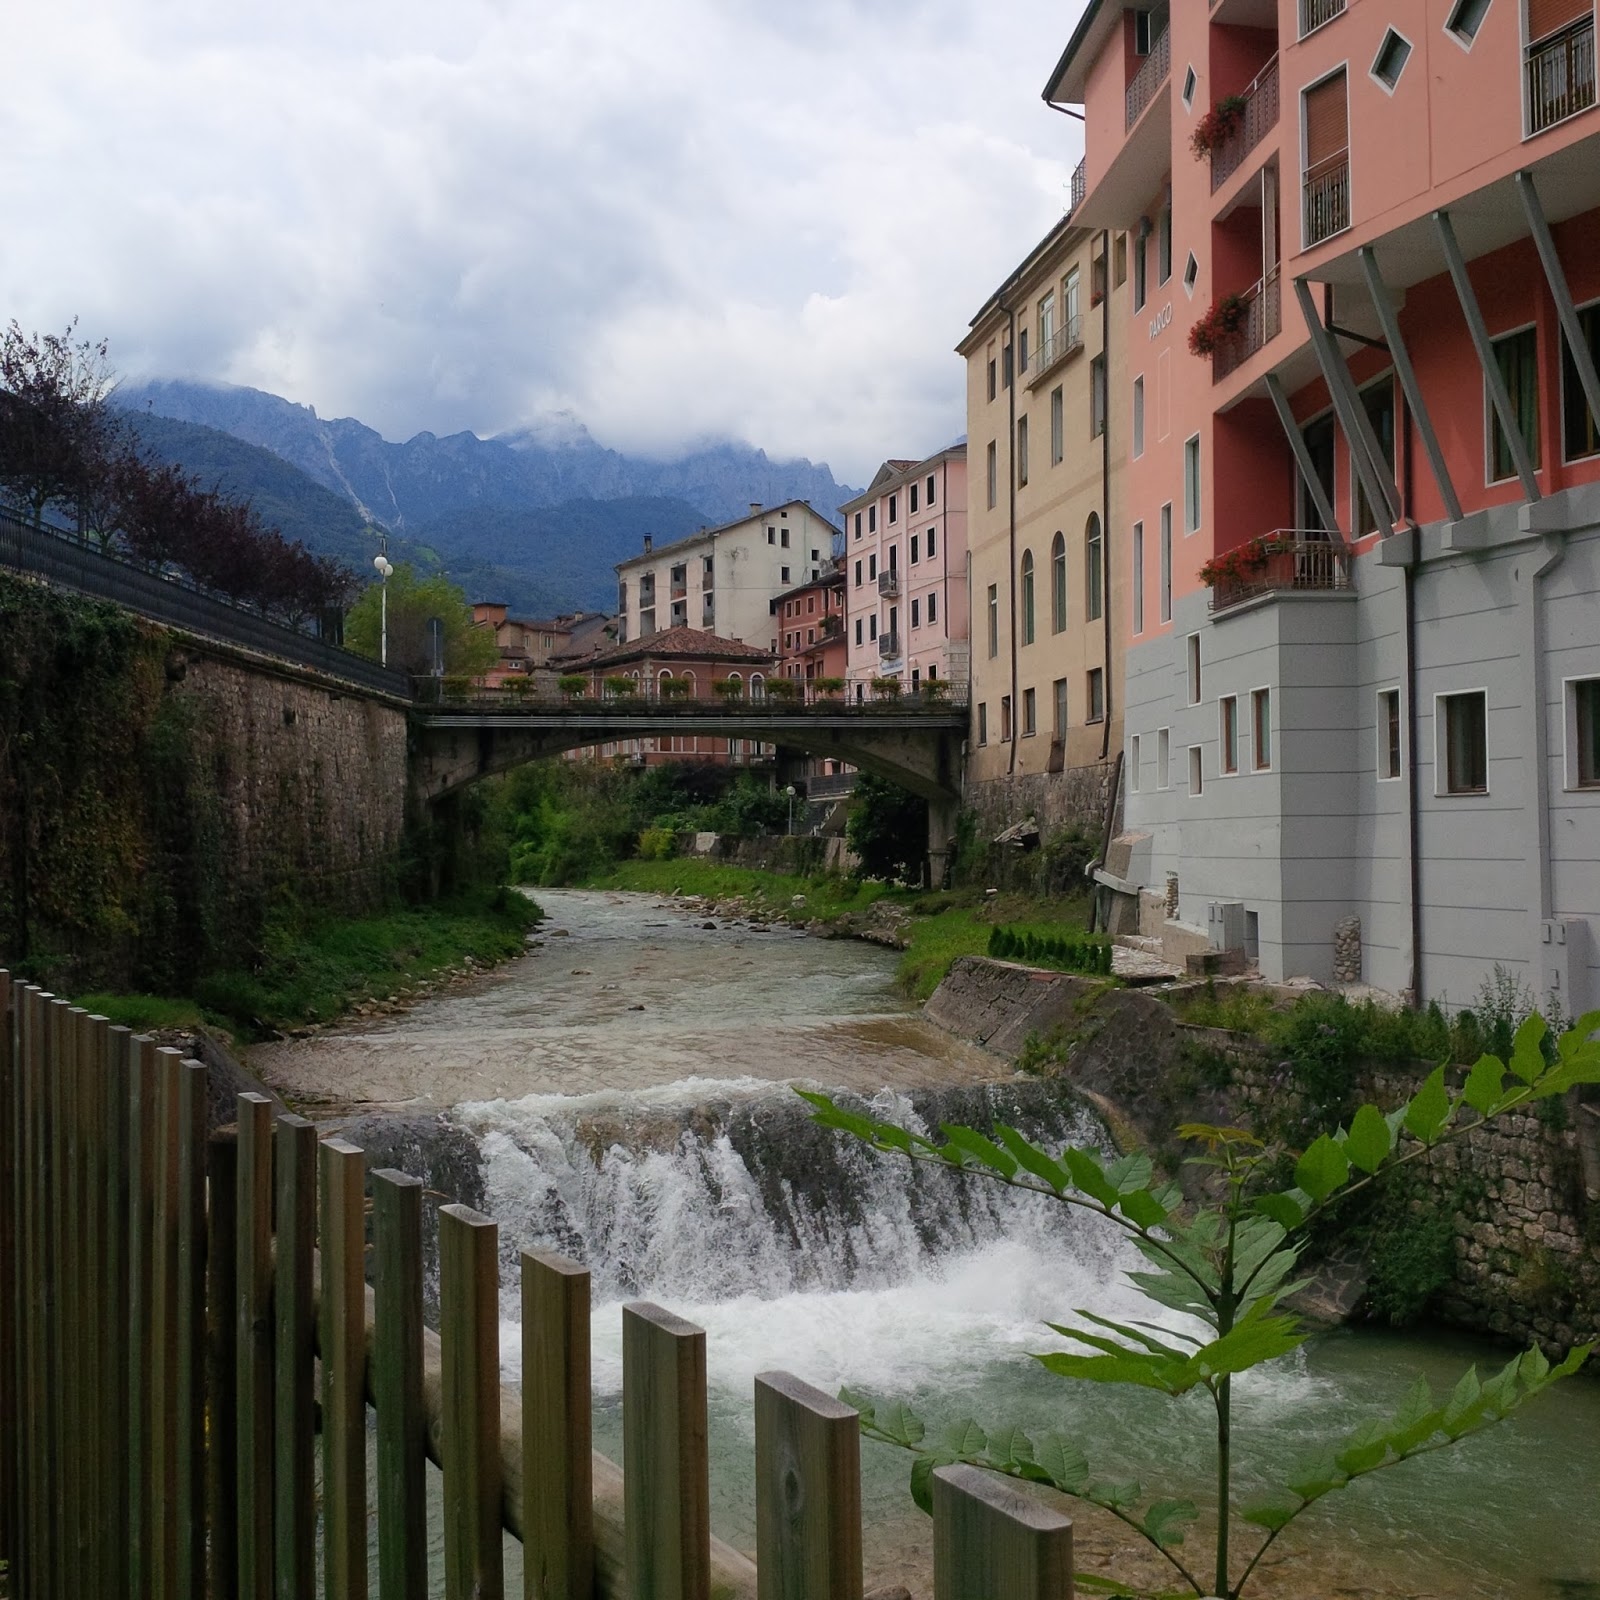 A view of Recoaro Terme, Veneto, Italy